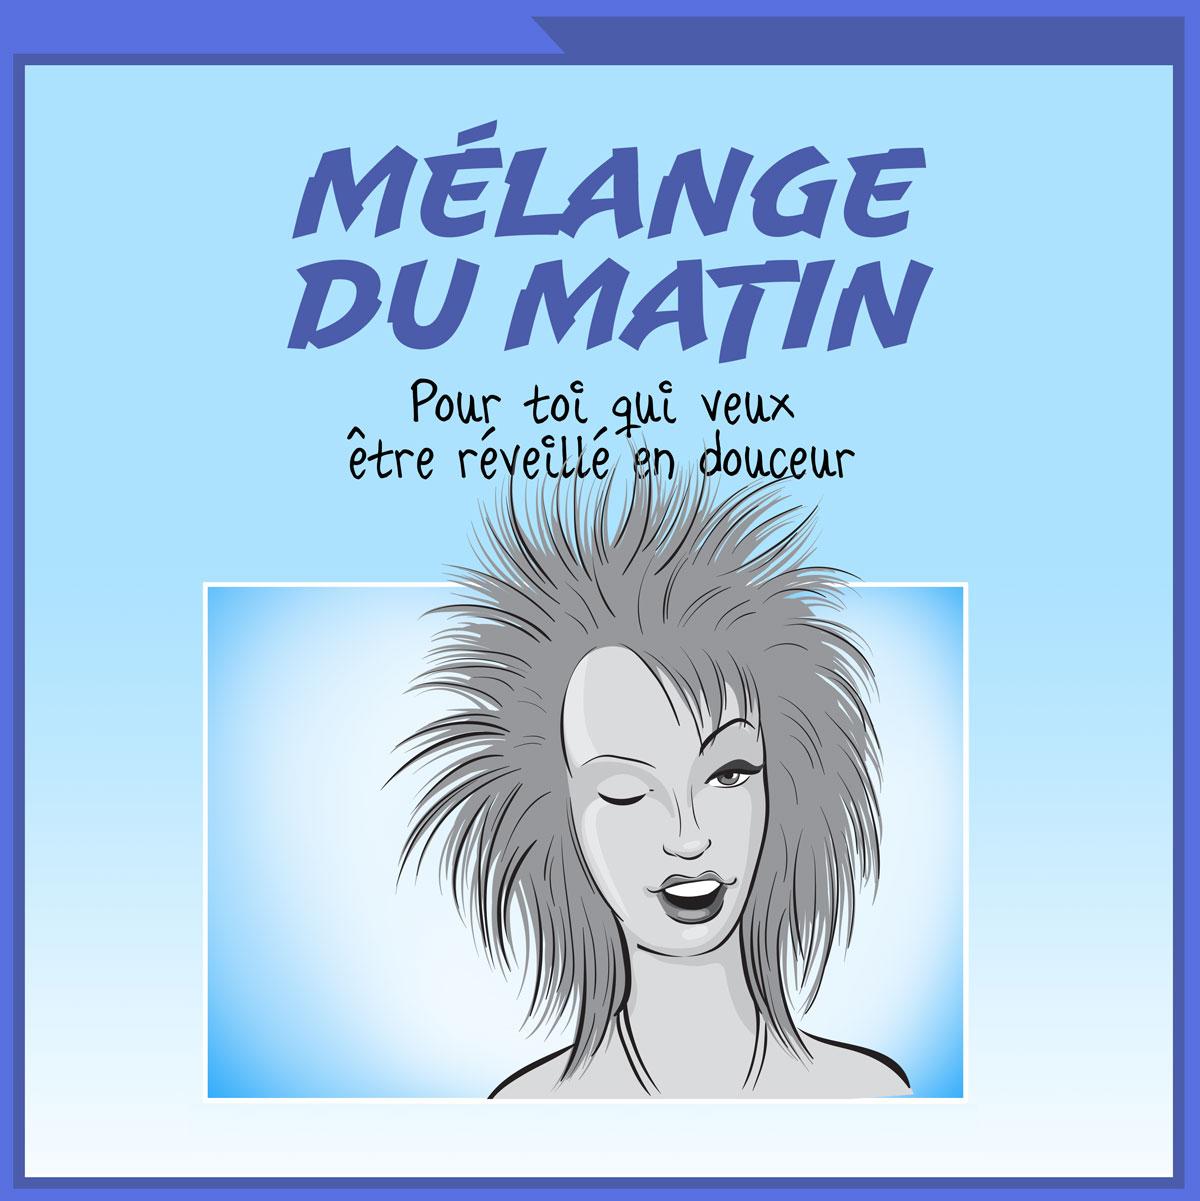 Mélange DU MATIN